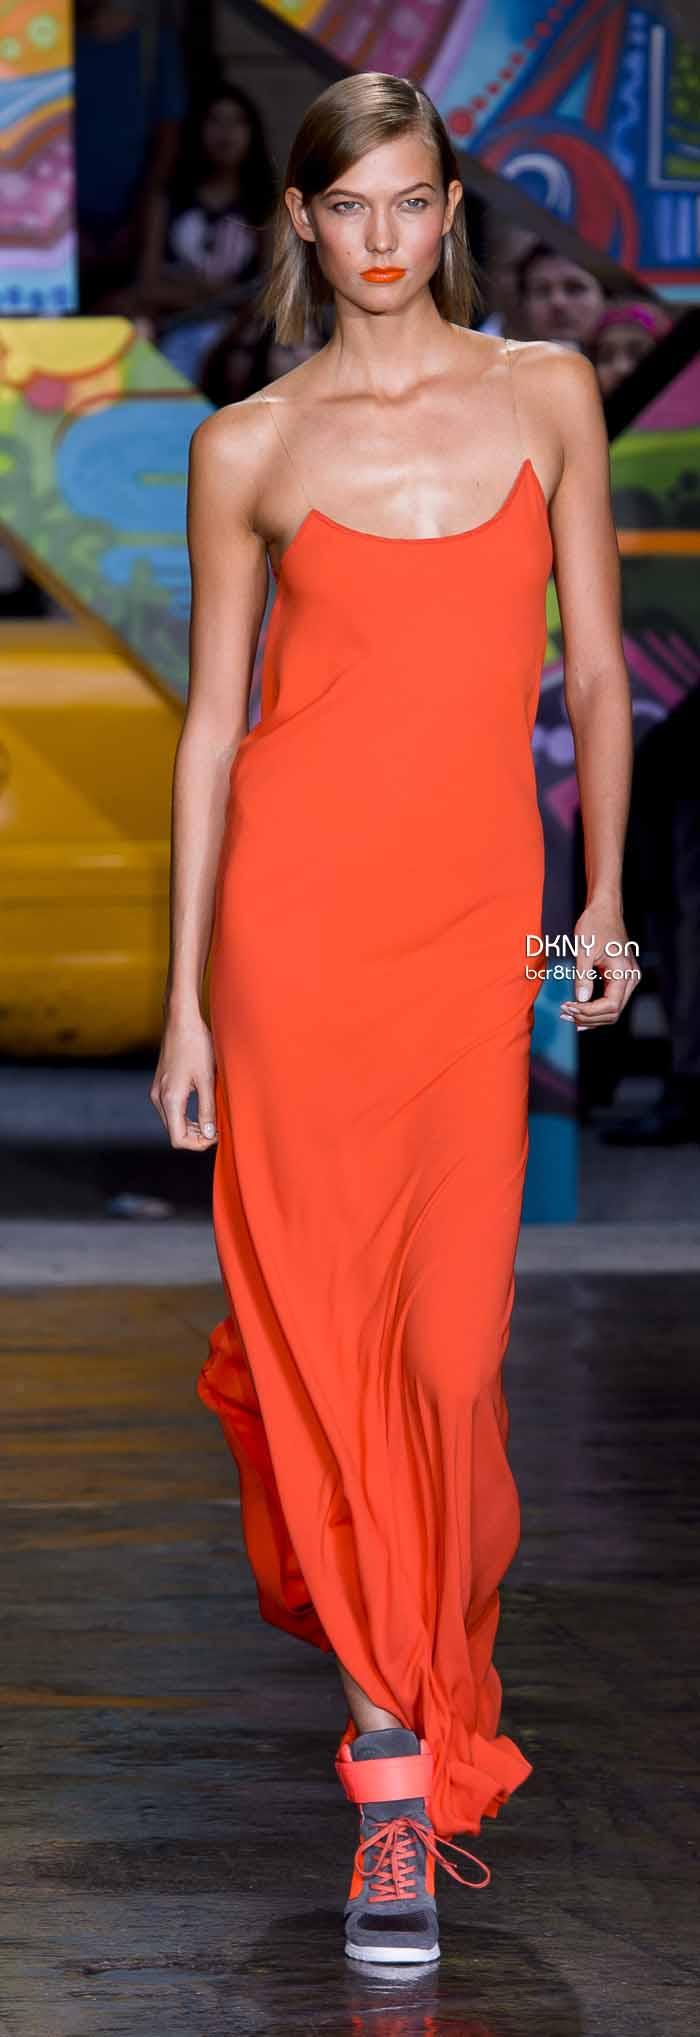 DKNY Spring 2014 #NYFW